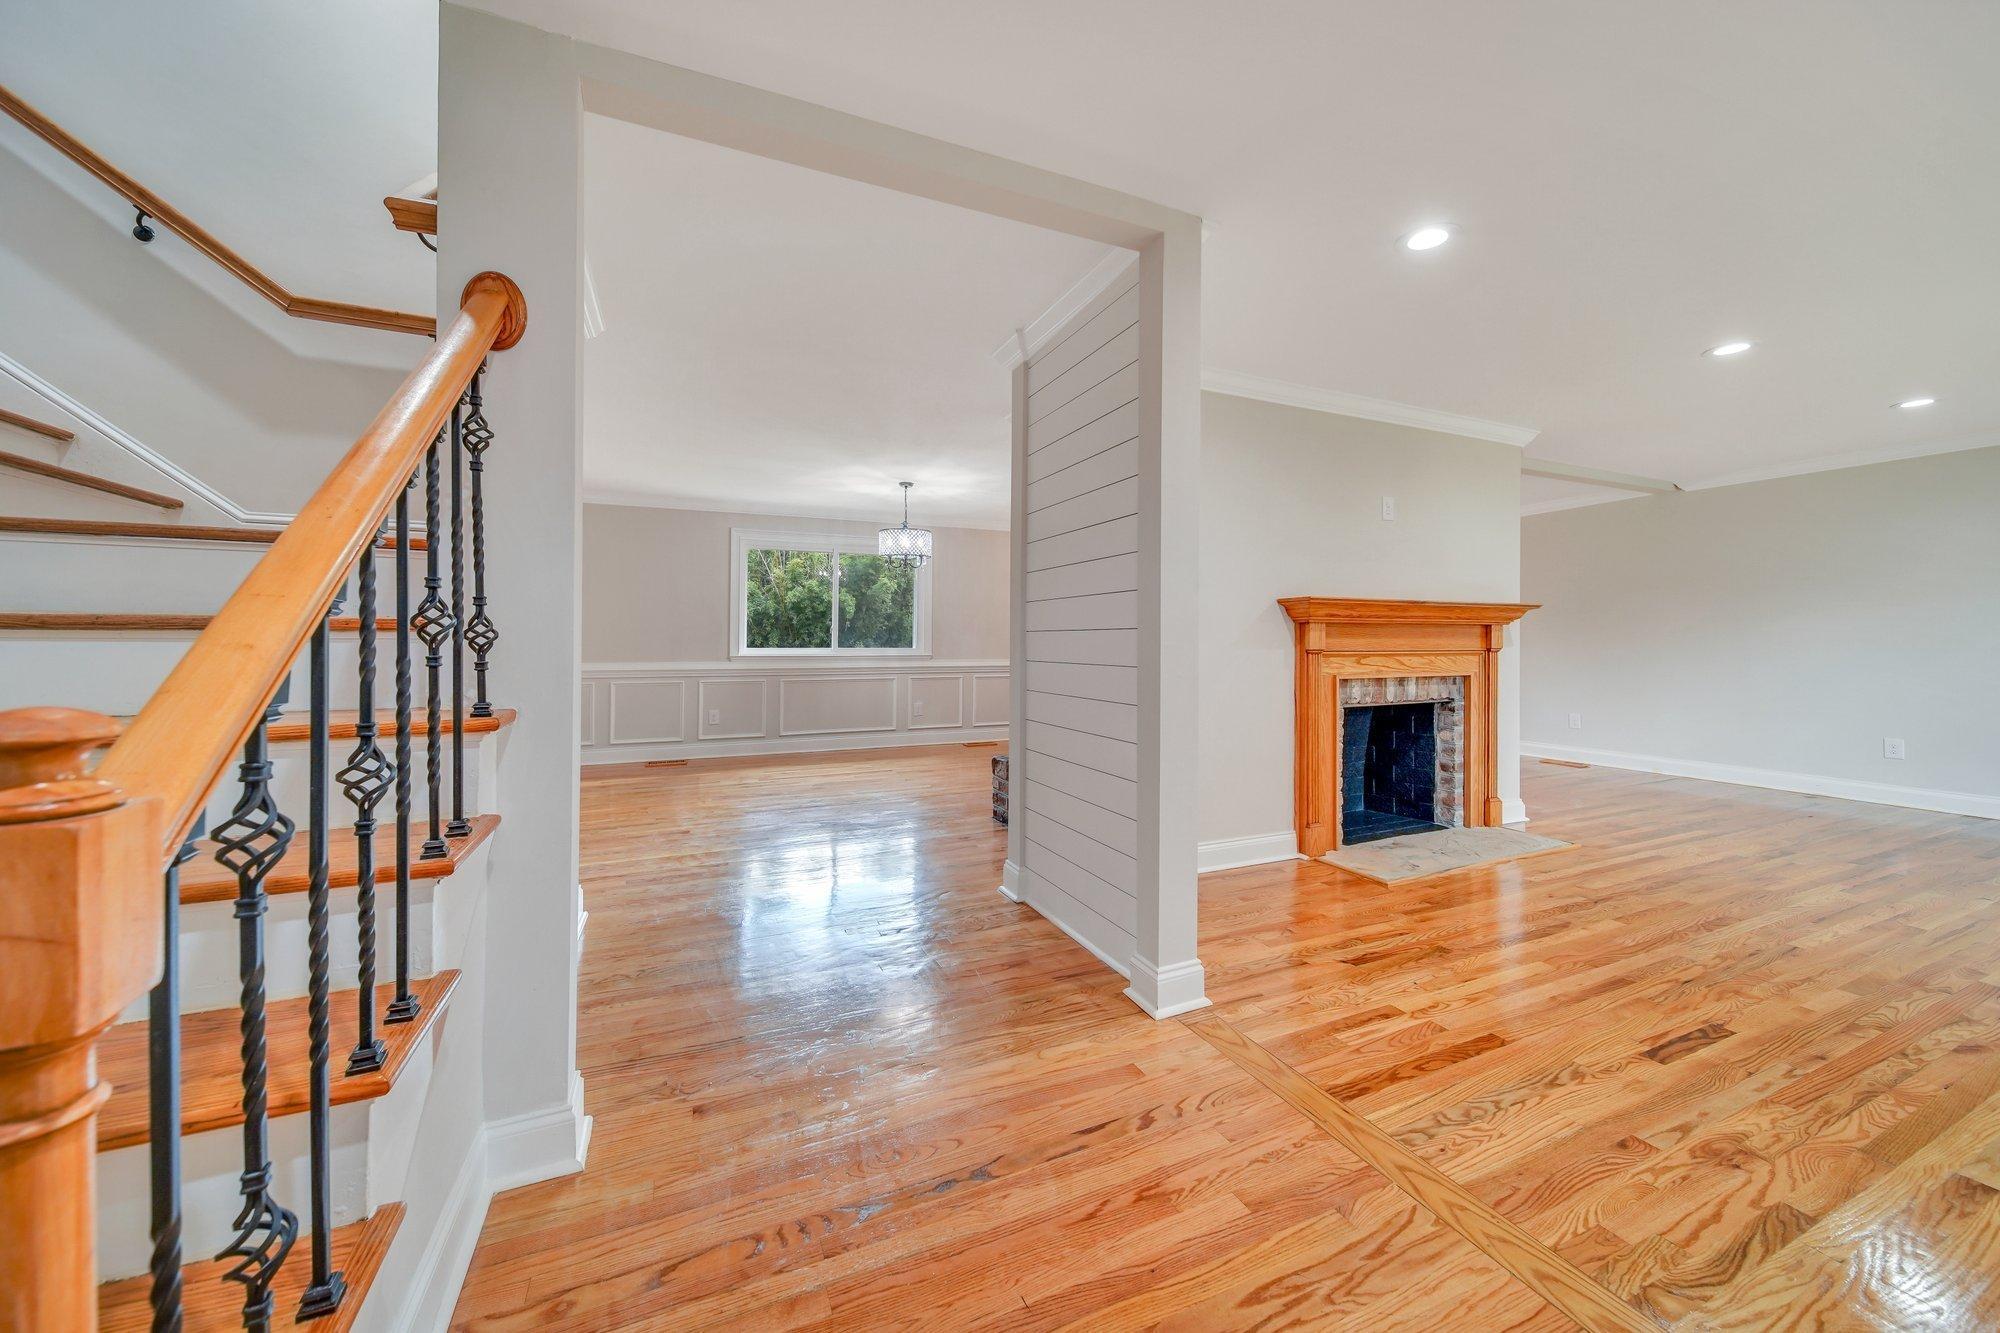 Country Club II Homes For Sale - 1477 Burningtree, Charleston, SC - 28